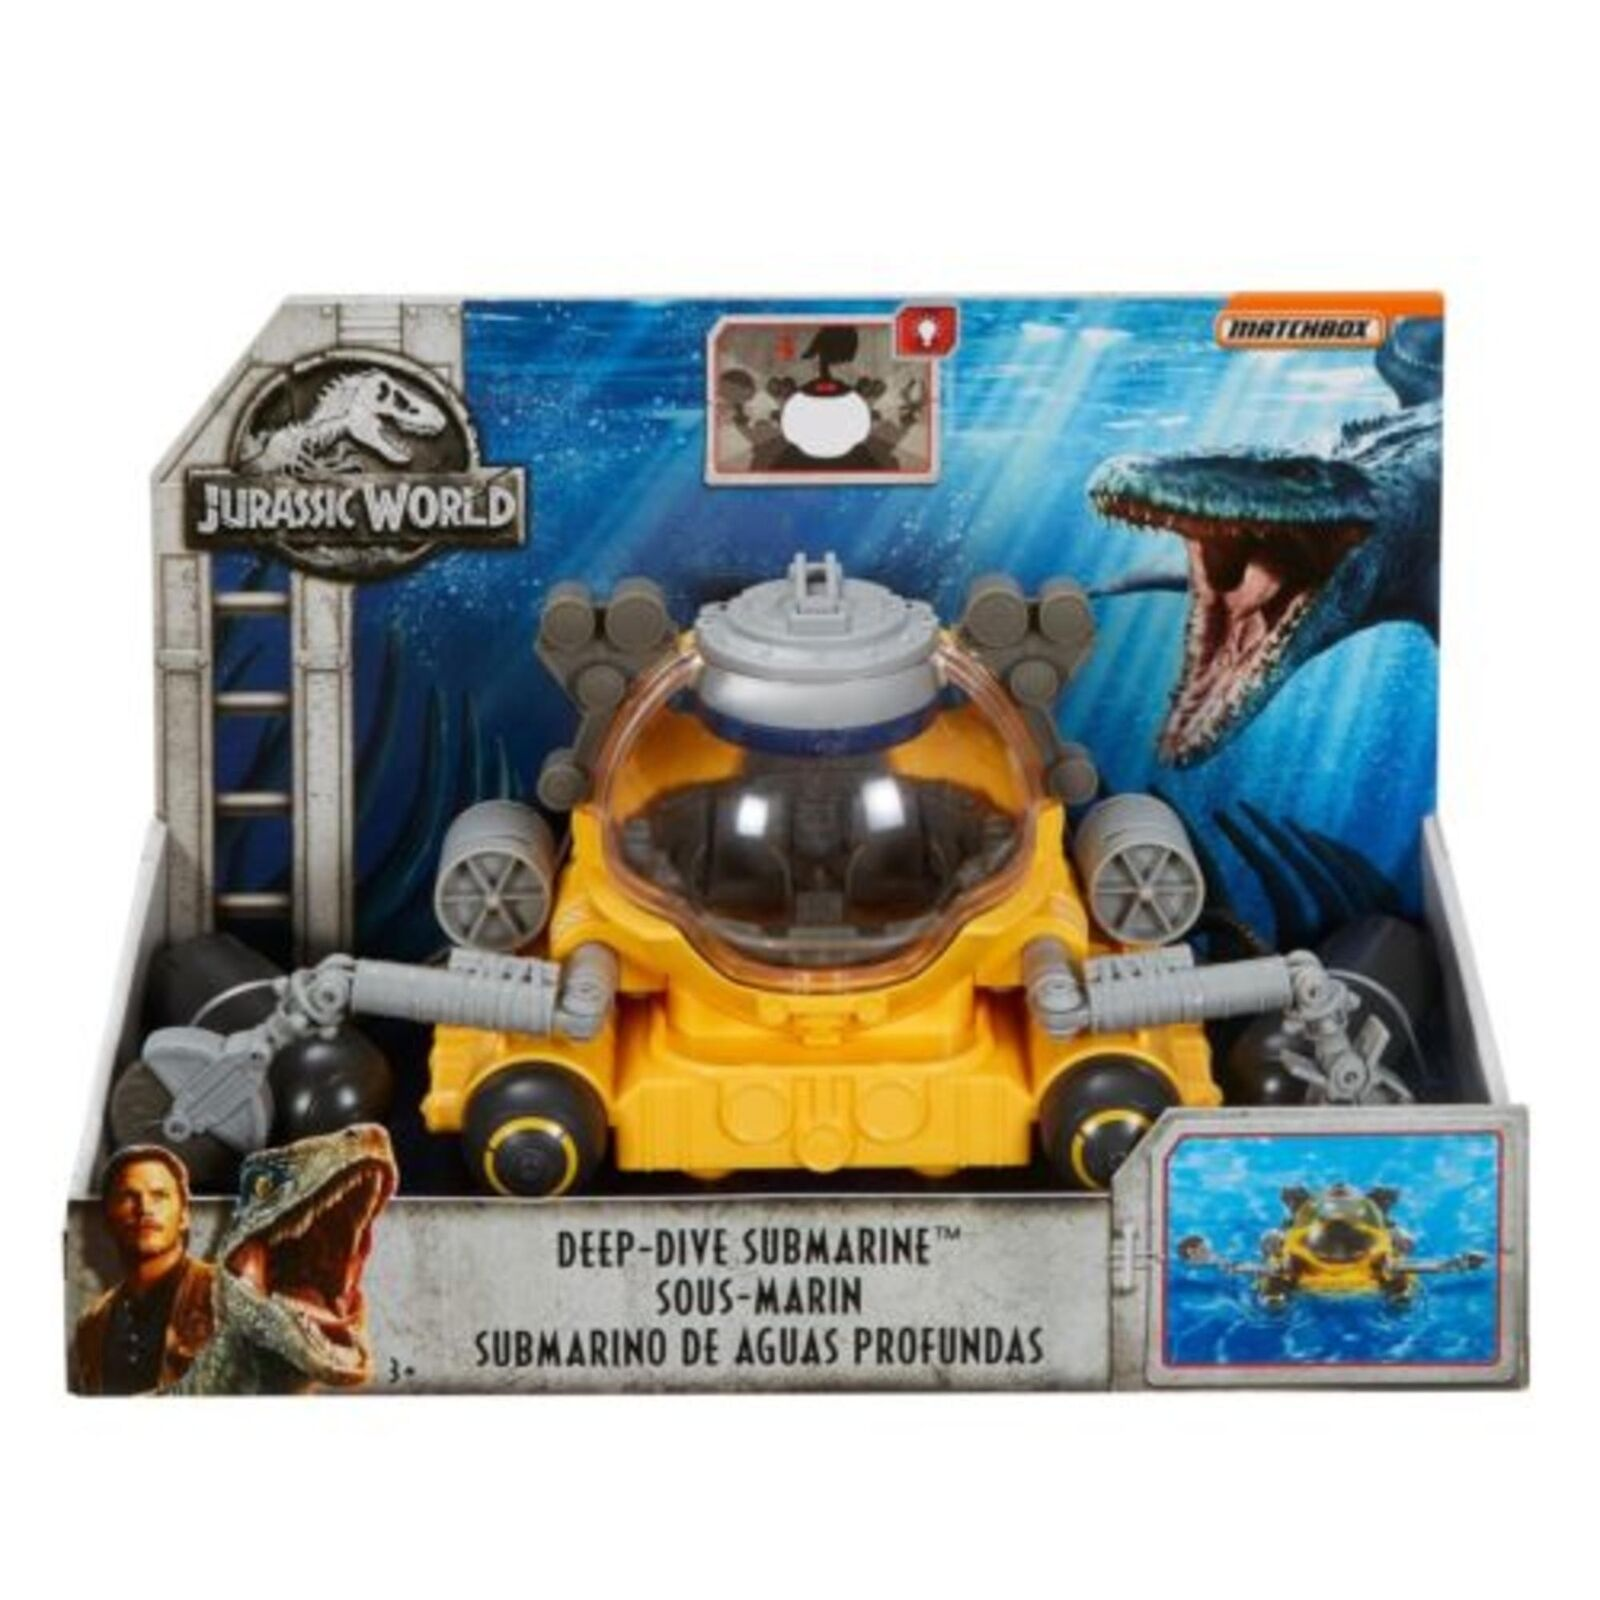 Matchbox Jurassic World Fallen Kingdom Deep Dive Submarine Vehicle Vehicle Vehicle f61185